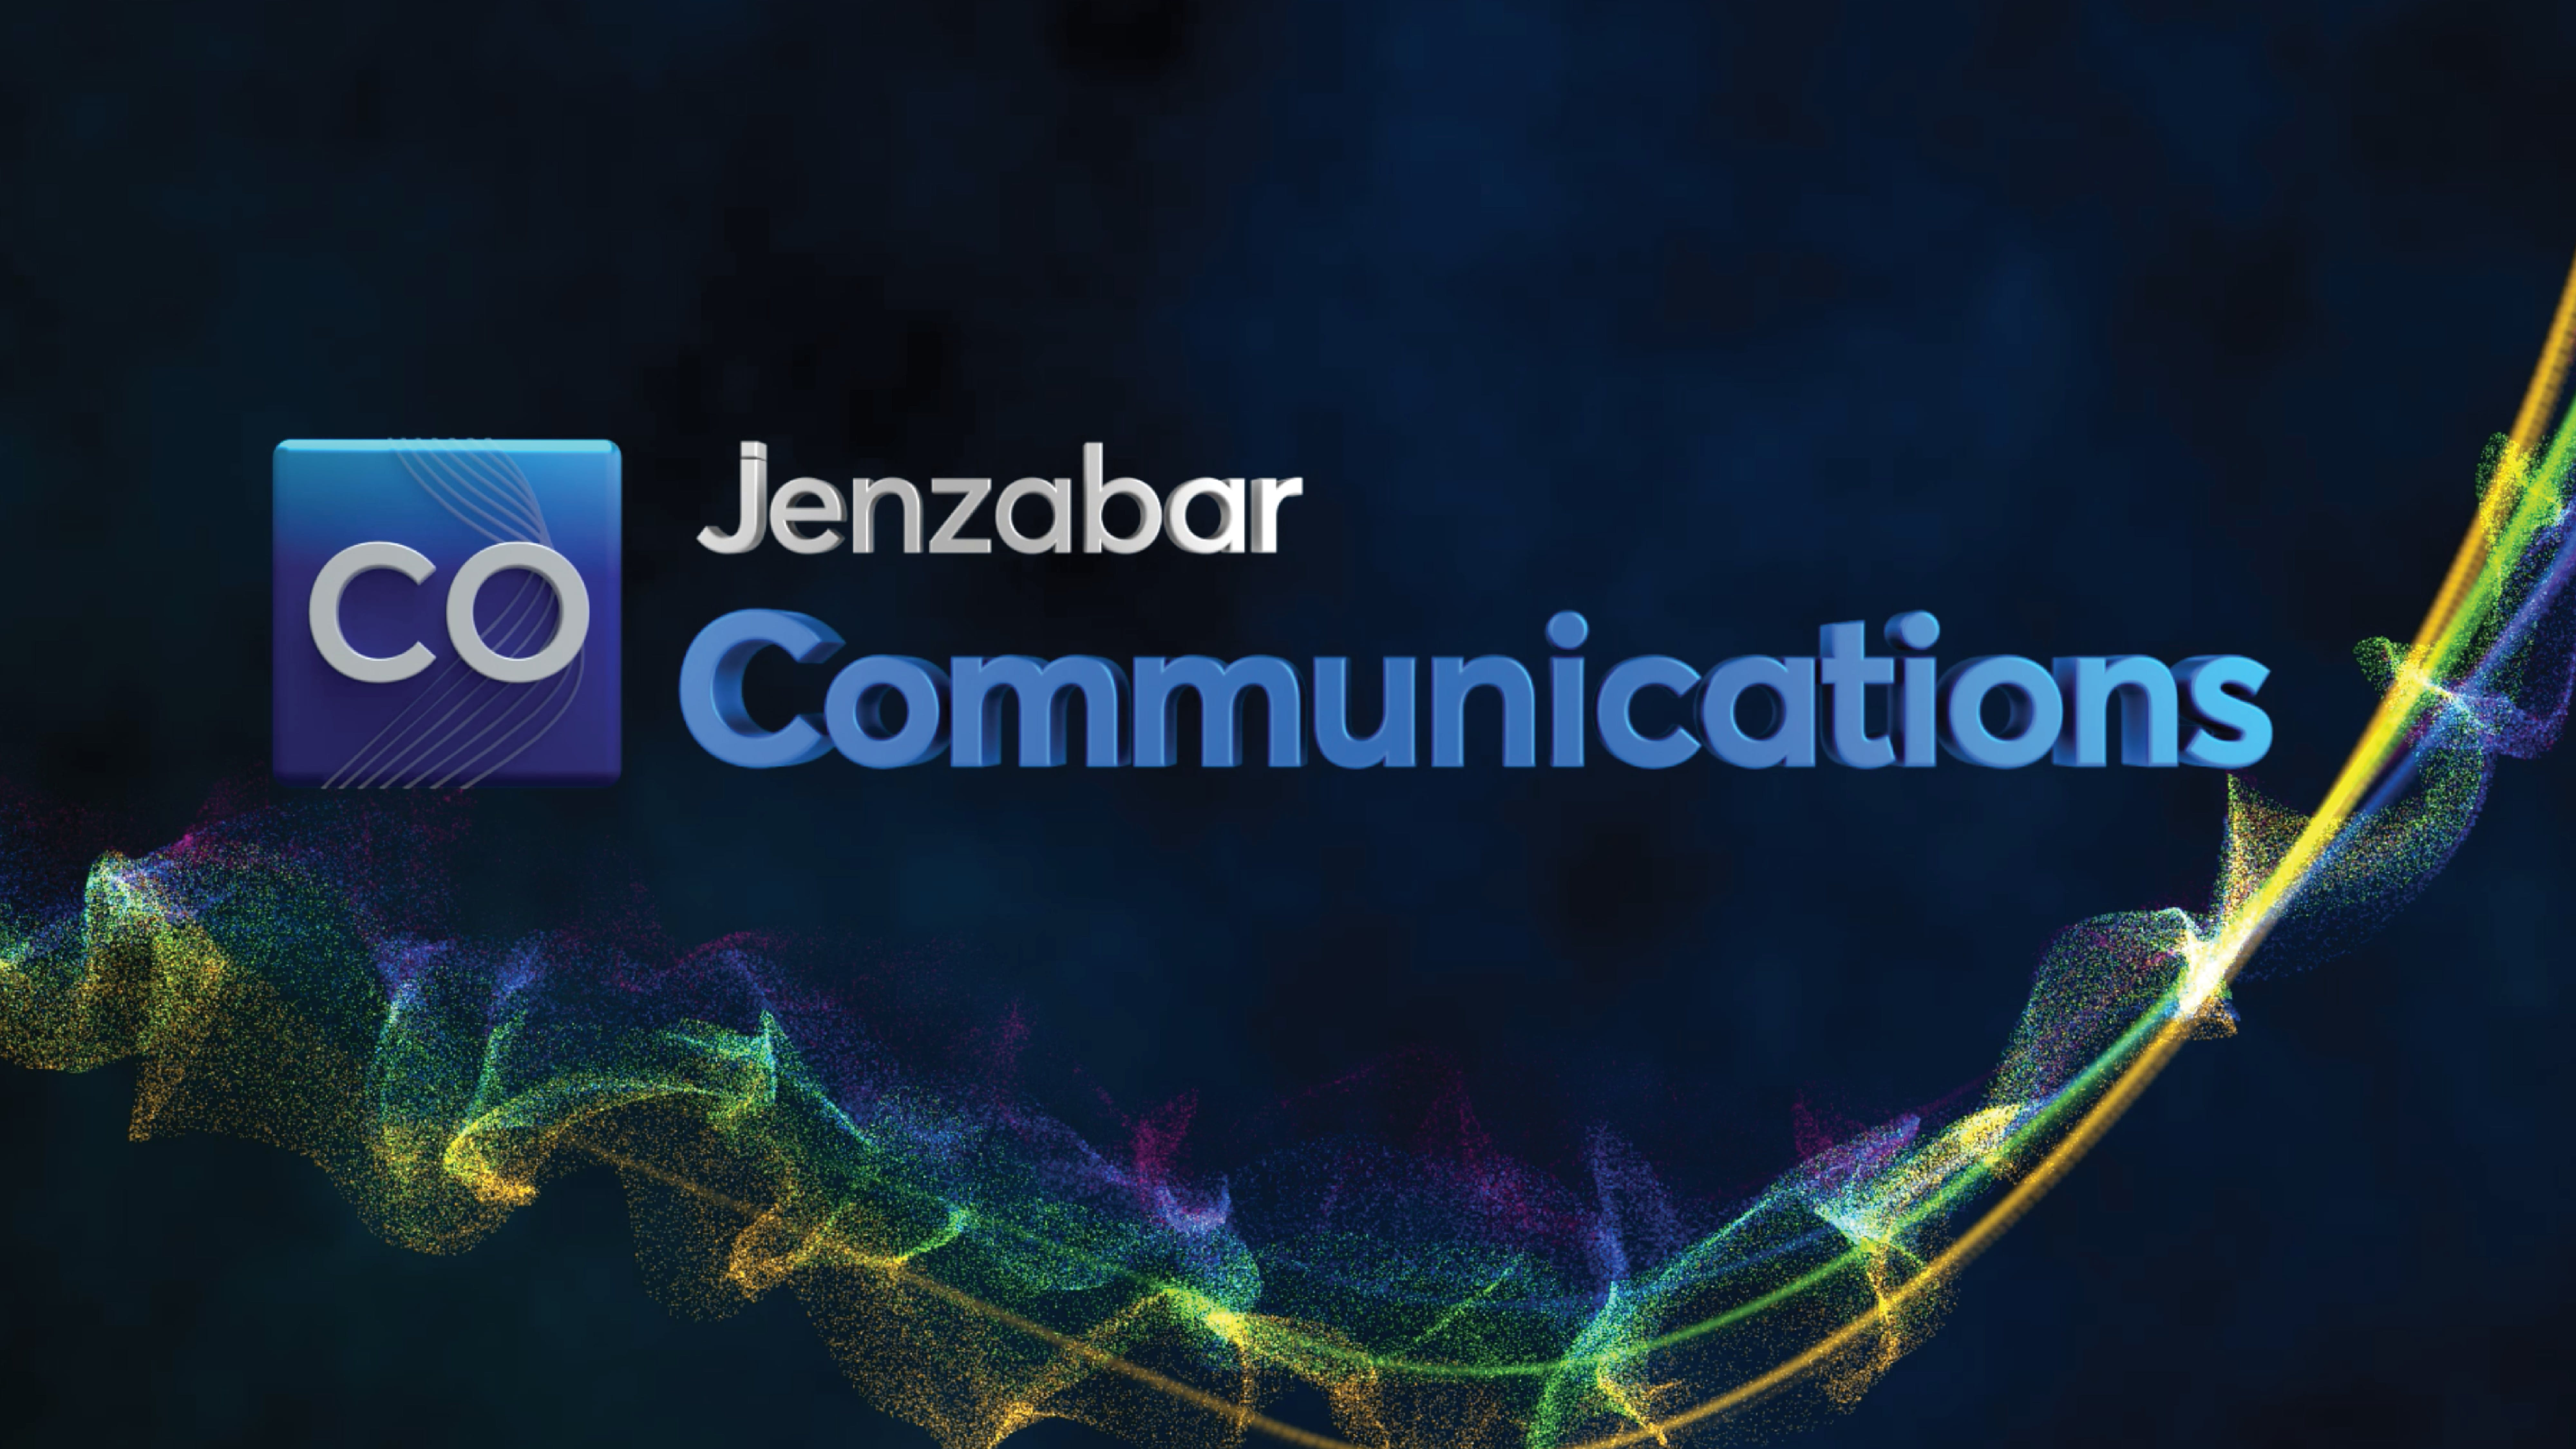 Jenzabar Communications Overview